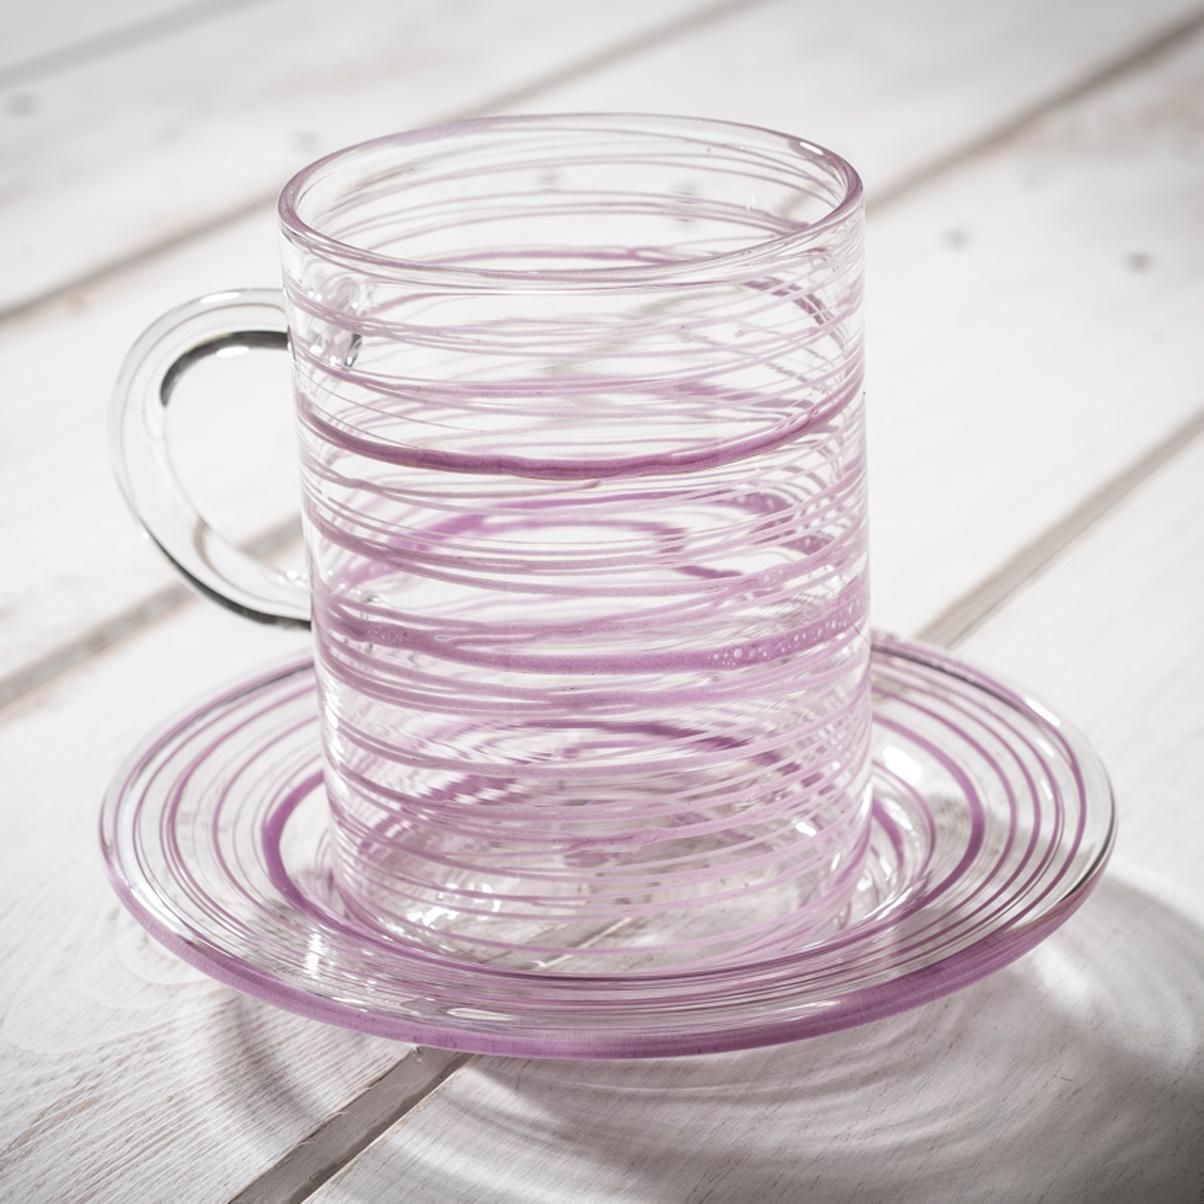 Italian hand blown glassware - AllÓRA